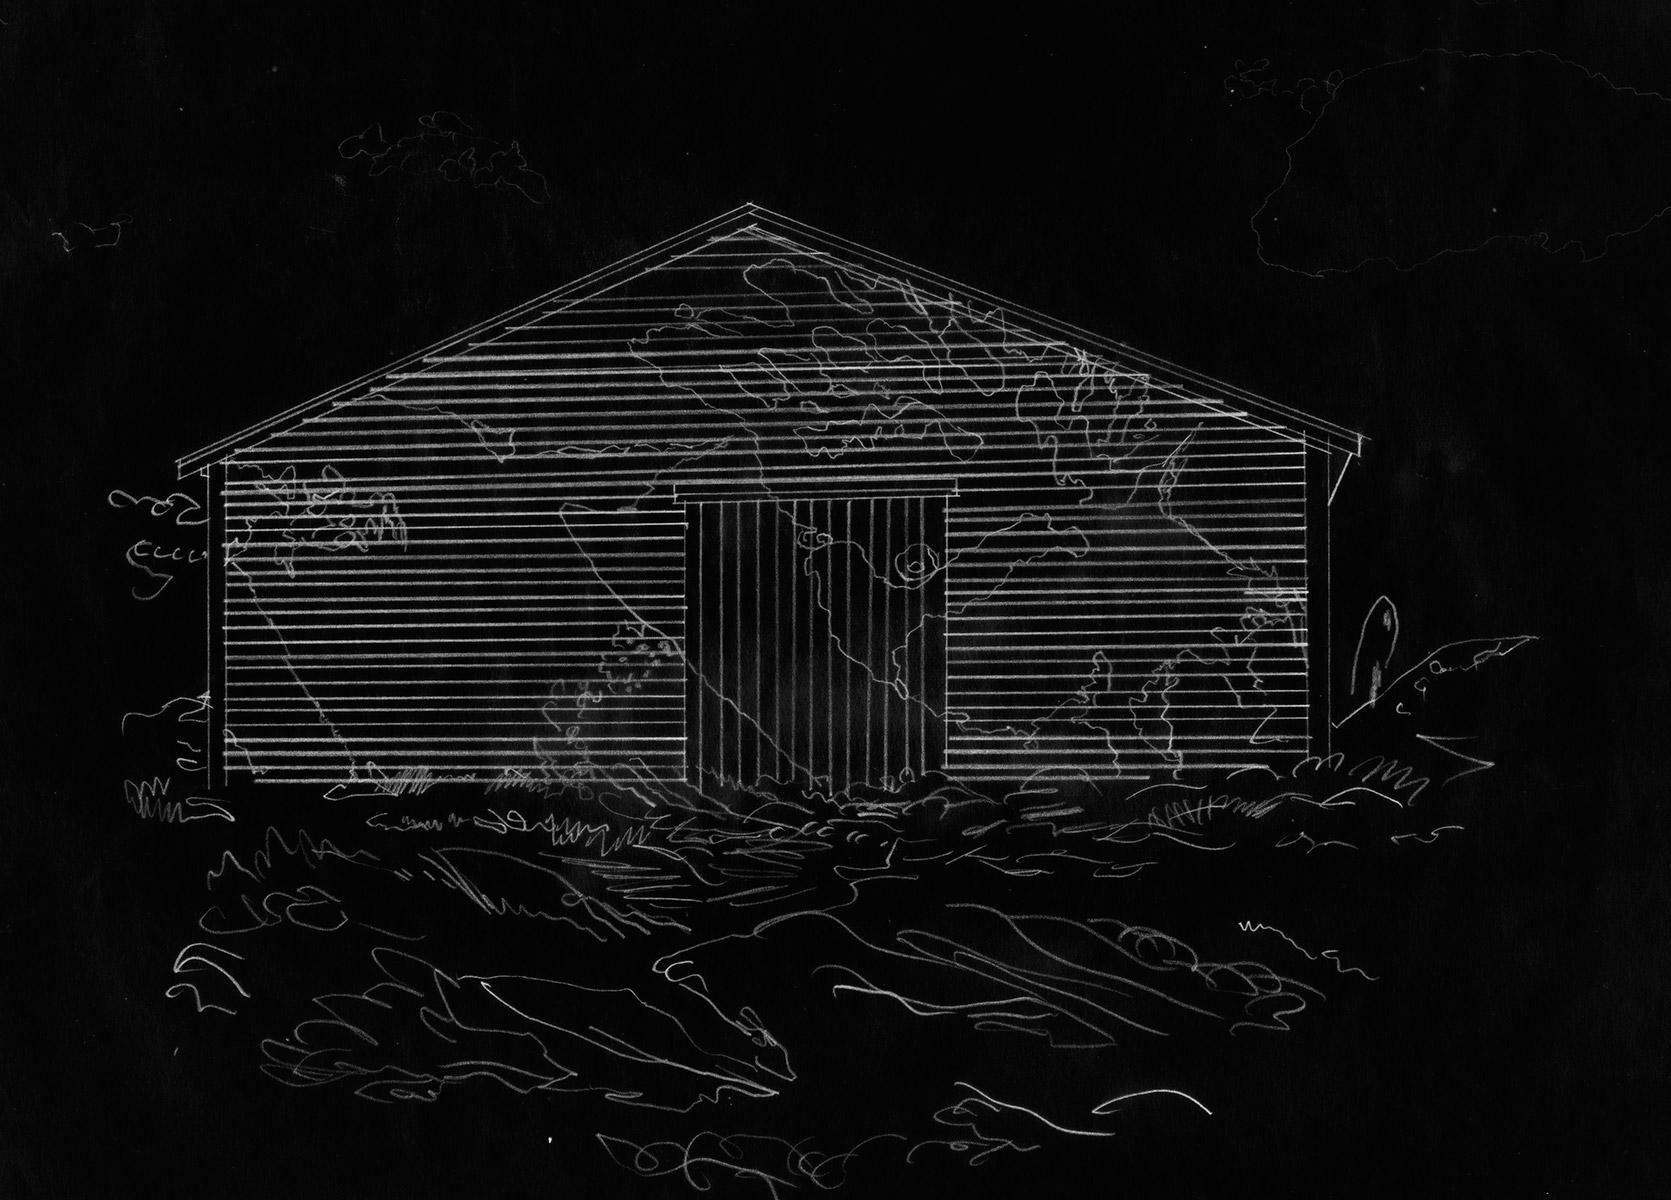 Nights & Shelters no.9